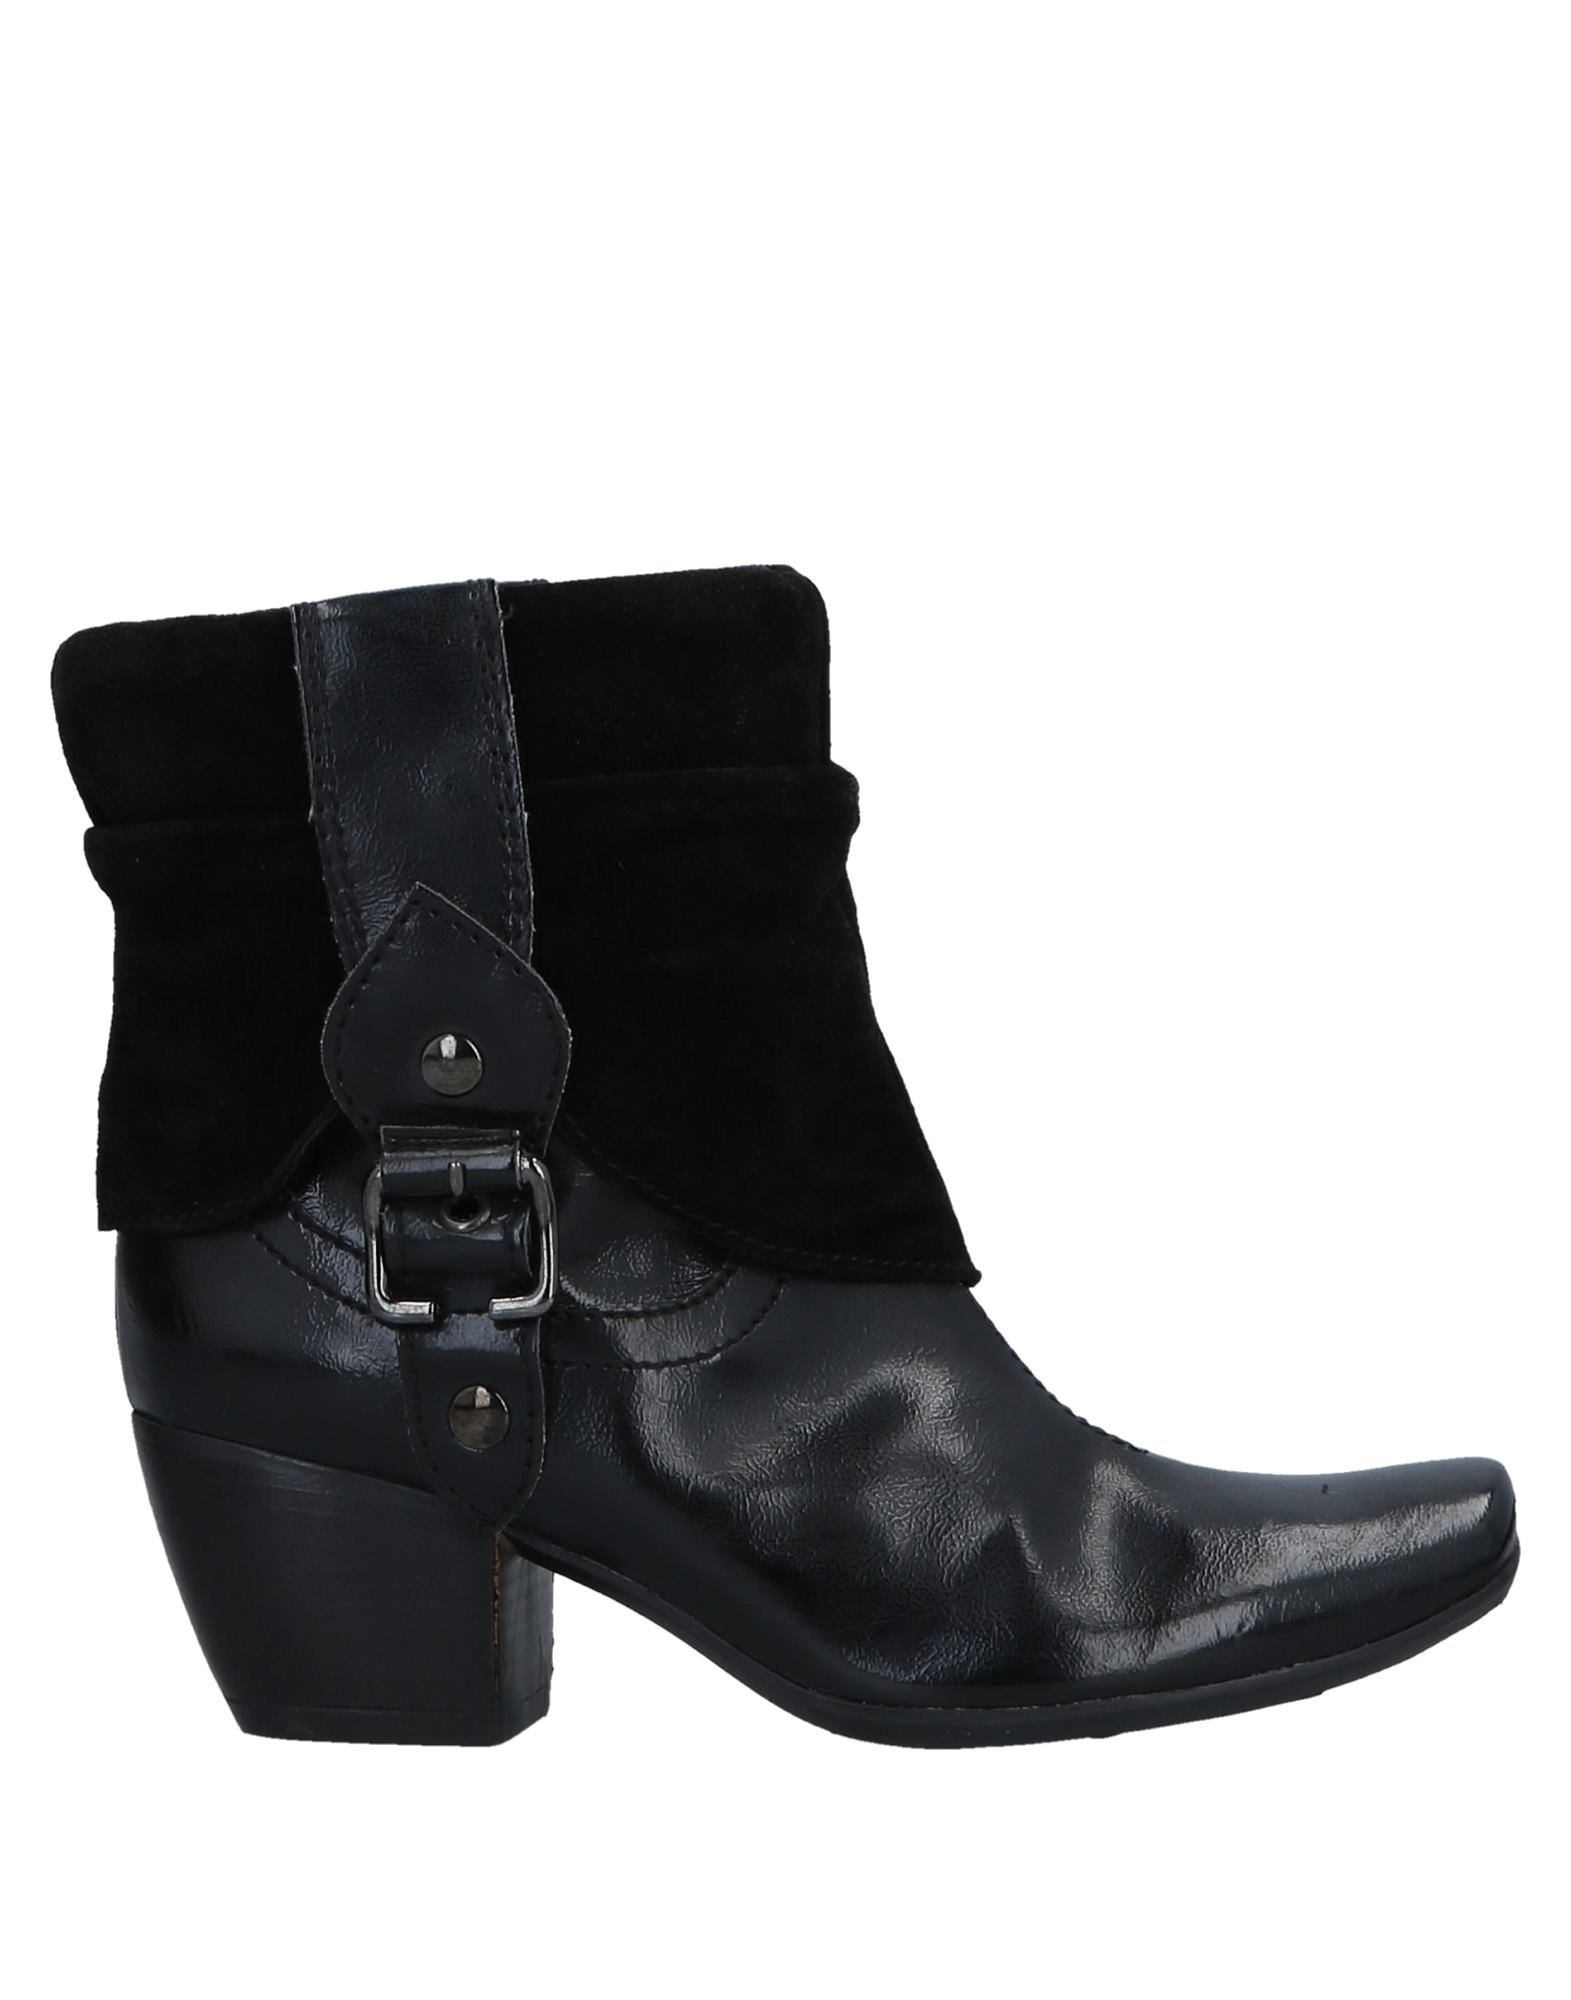 Fausta Moretti 11523364SC Stiefelette Damen  11523364SC Moretti Gute Qualität beliebte Schuhe 8cf875